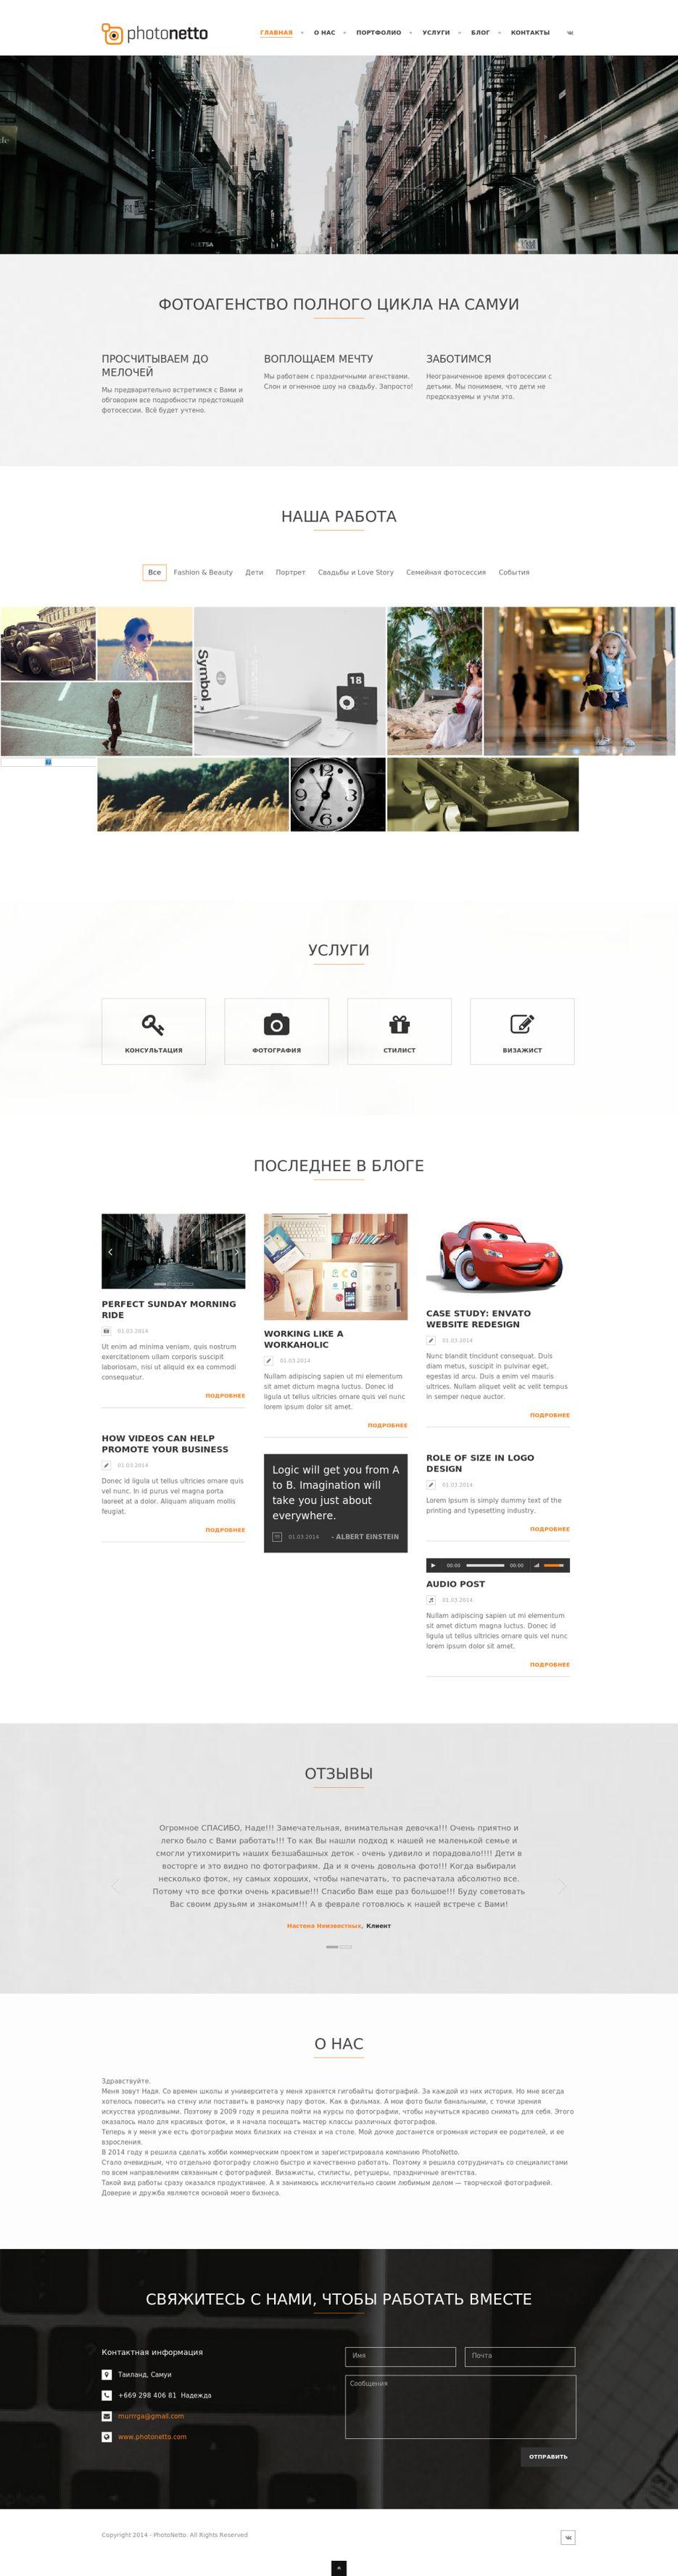 Домашняя страница сайта